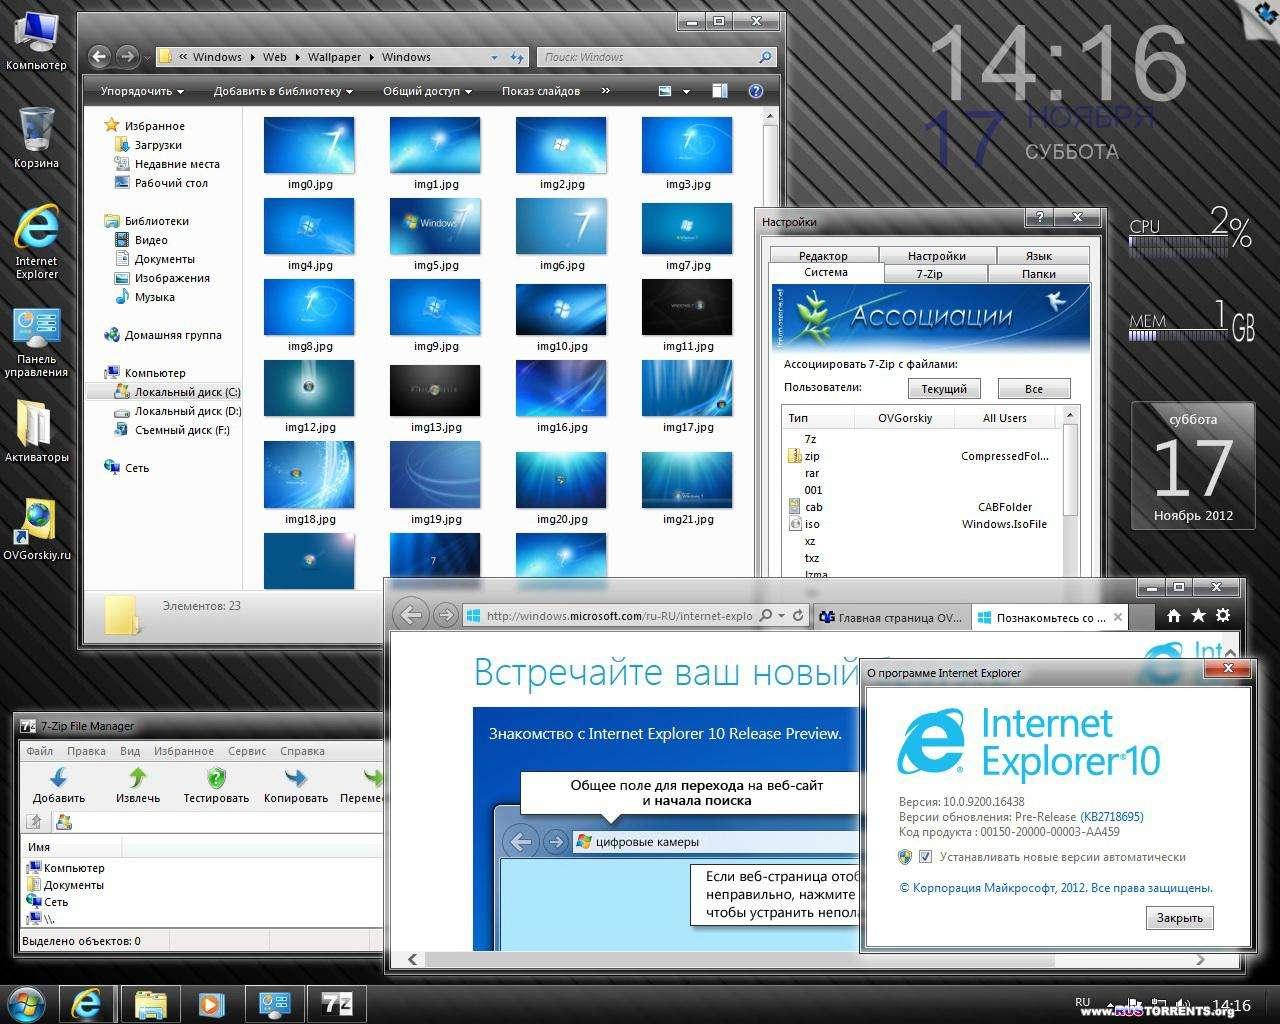 Windows 7 Ultimate nBook ie10 x86-x64 Ru by OVGorskiy 11.2012 [�������]